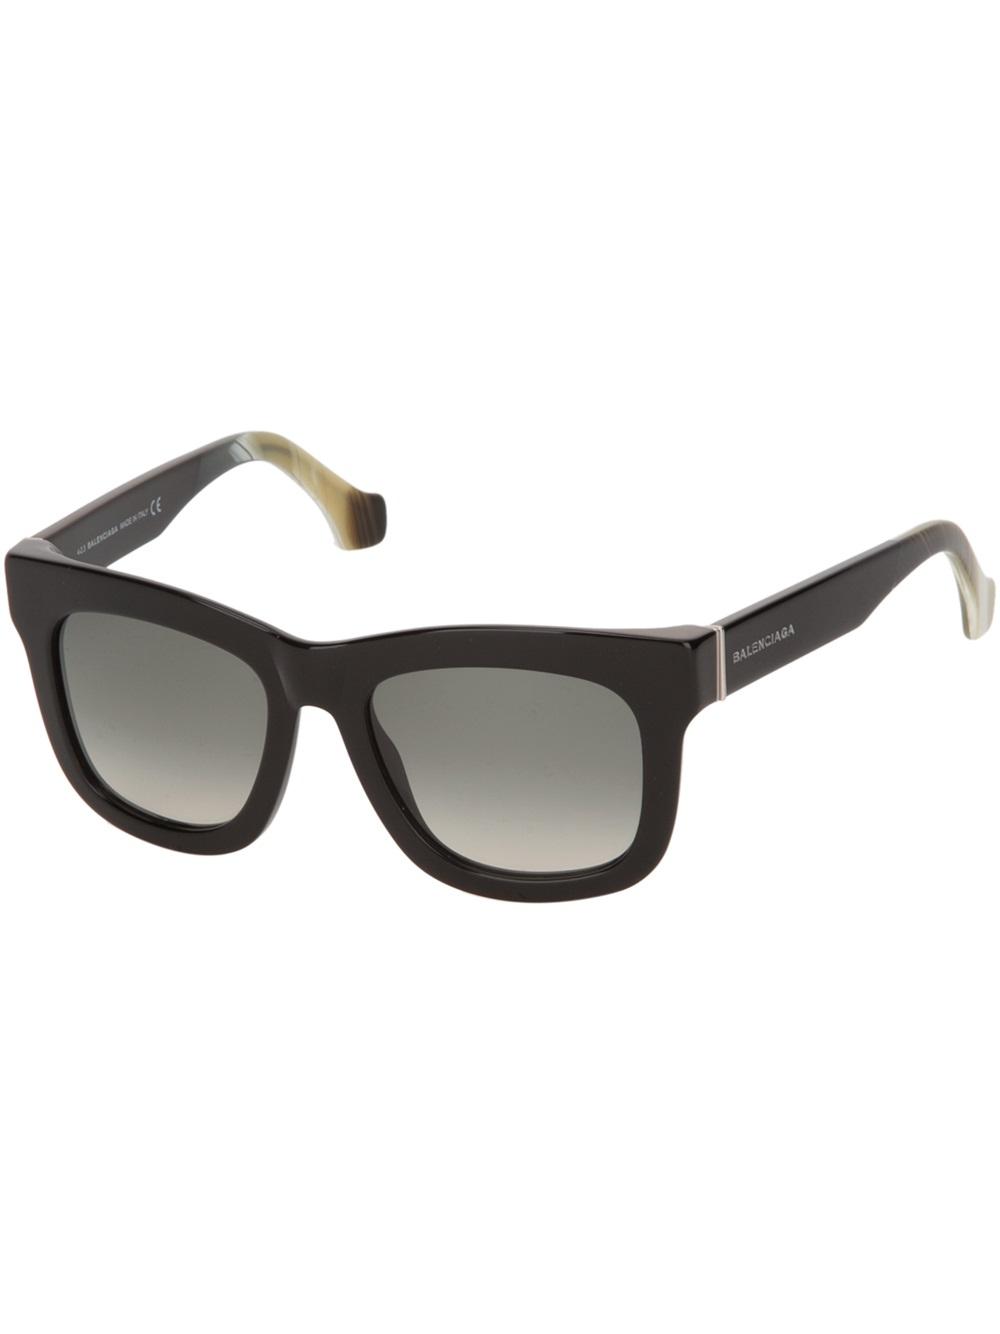 31a3dddd0ee Balenciaga Square Frame Sunglasses in Black for Men - Lyst